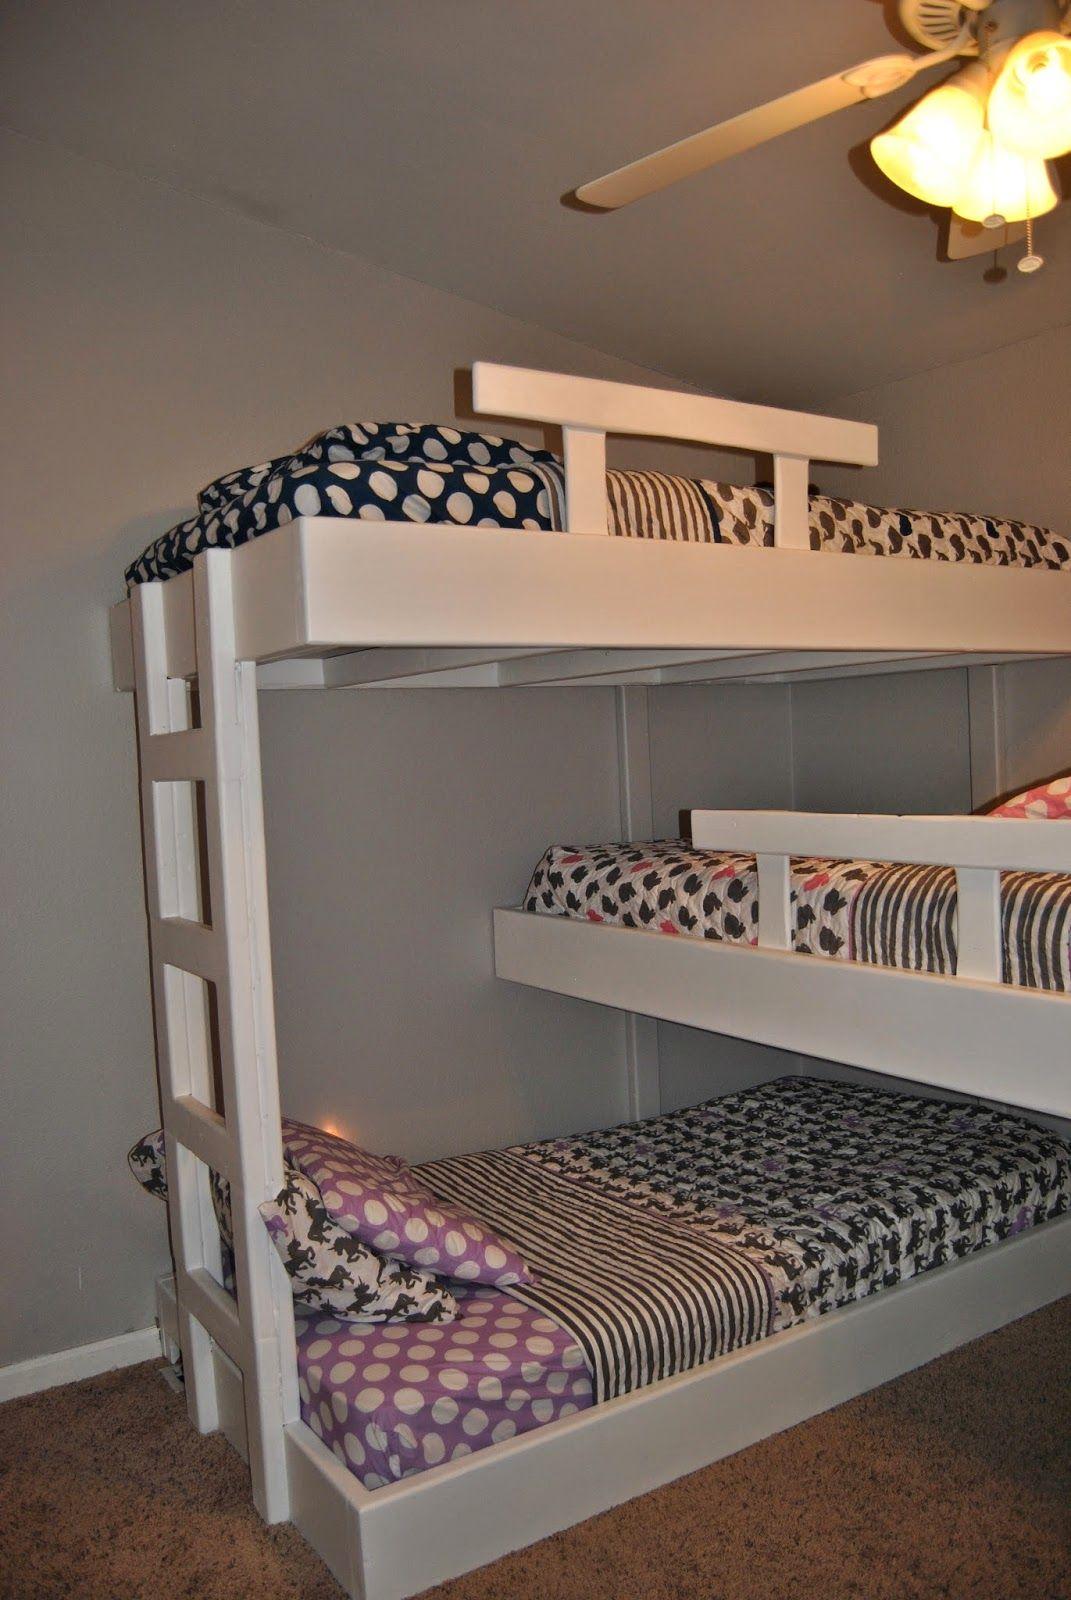 Best Triple Bunk Beds Triple Bunk Beds Kids Bunk Beds Bunk Beds 640 x 480